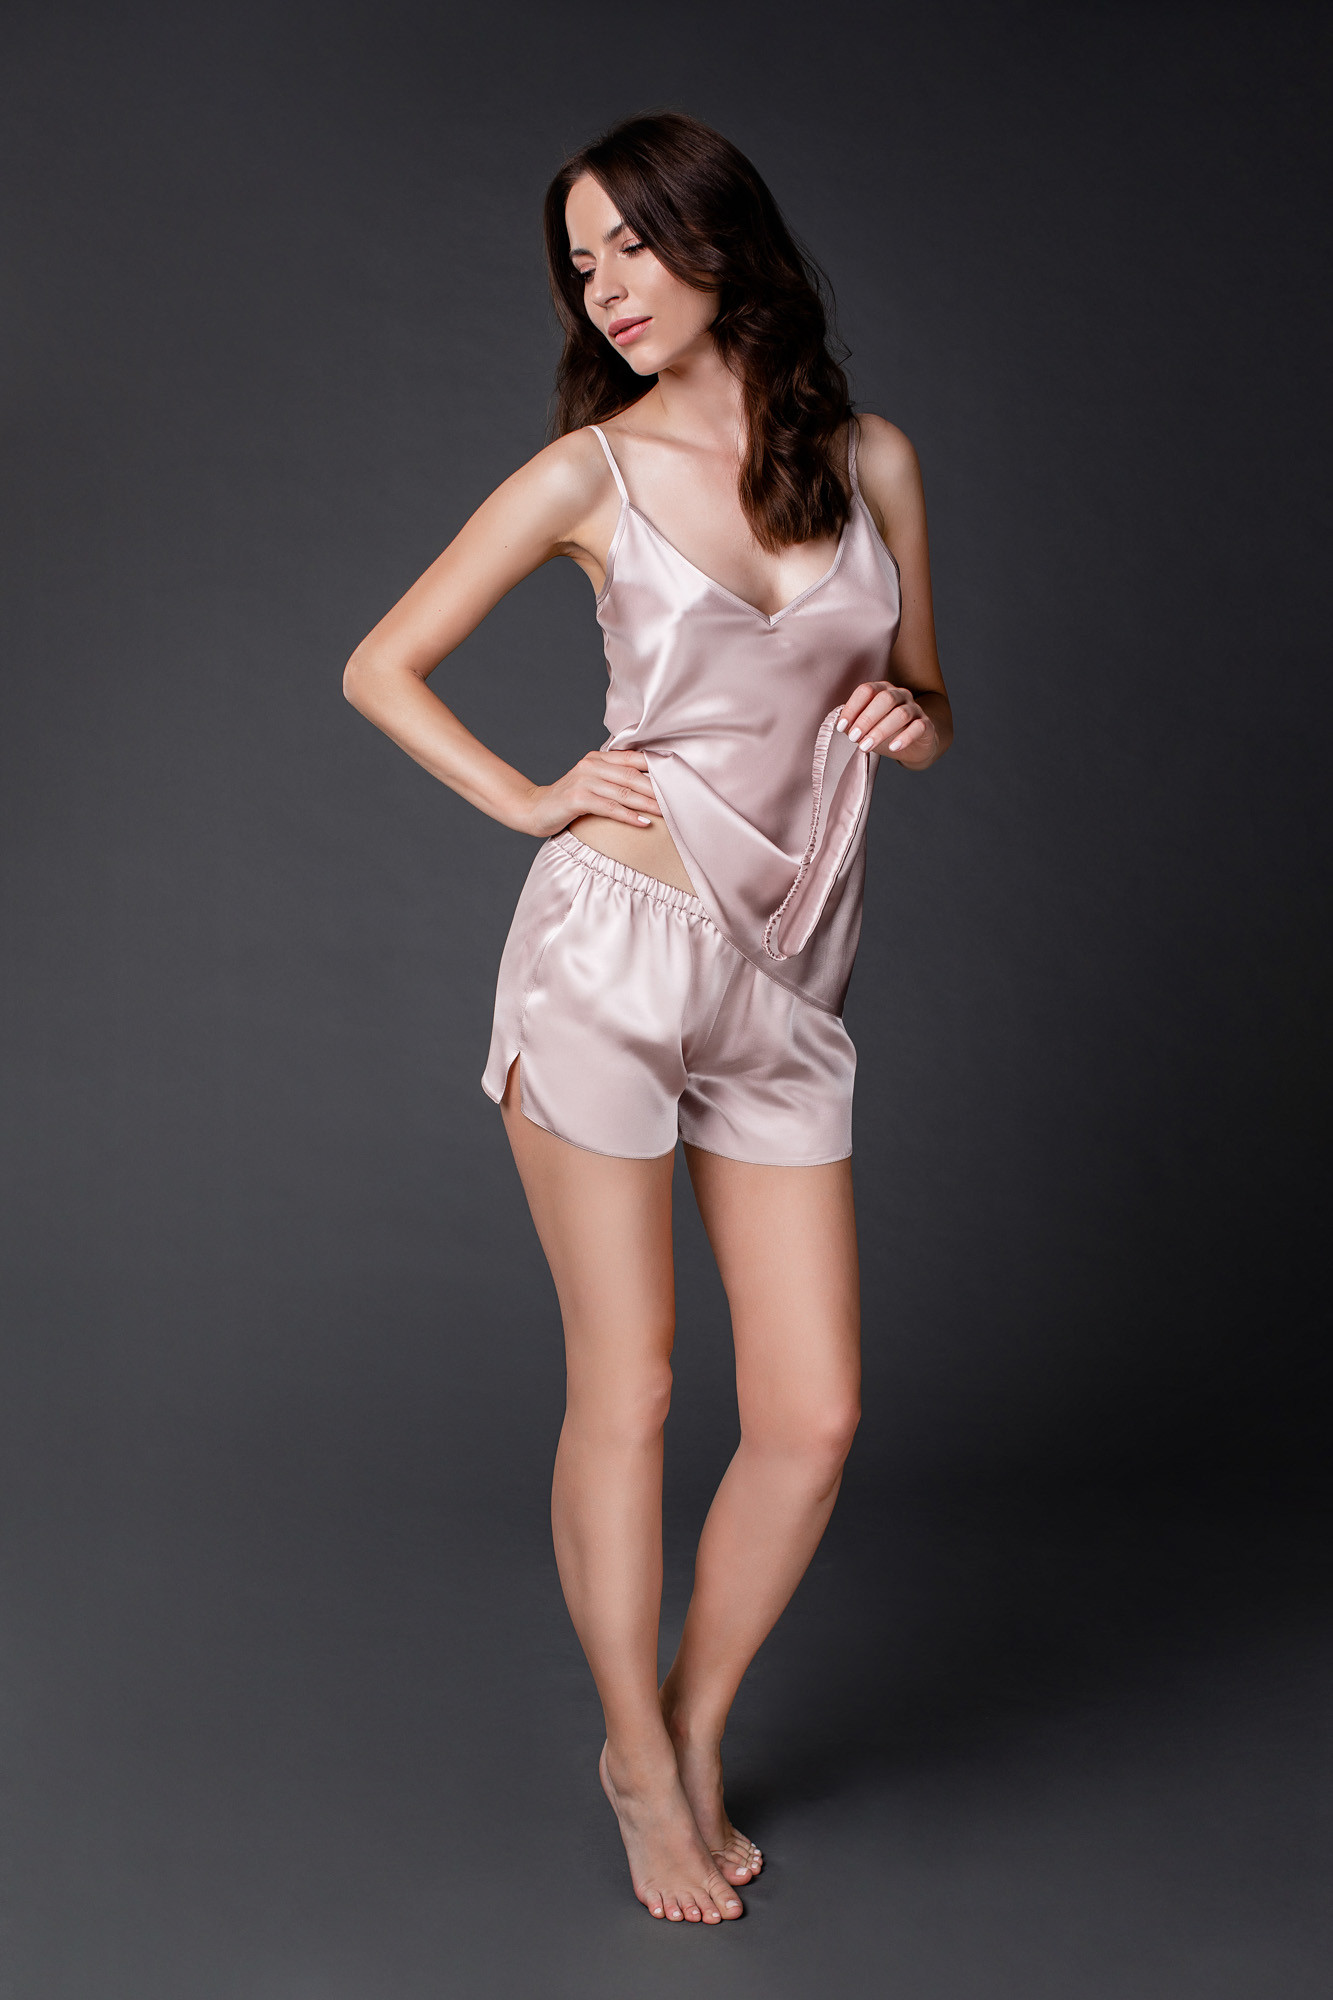 Jedwabna piżama Jasmine - Endorfinella